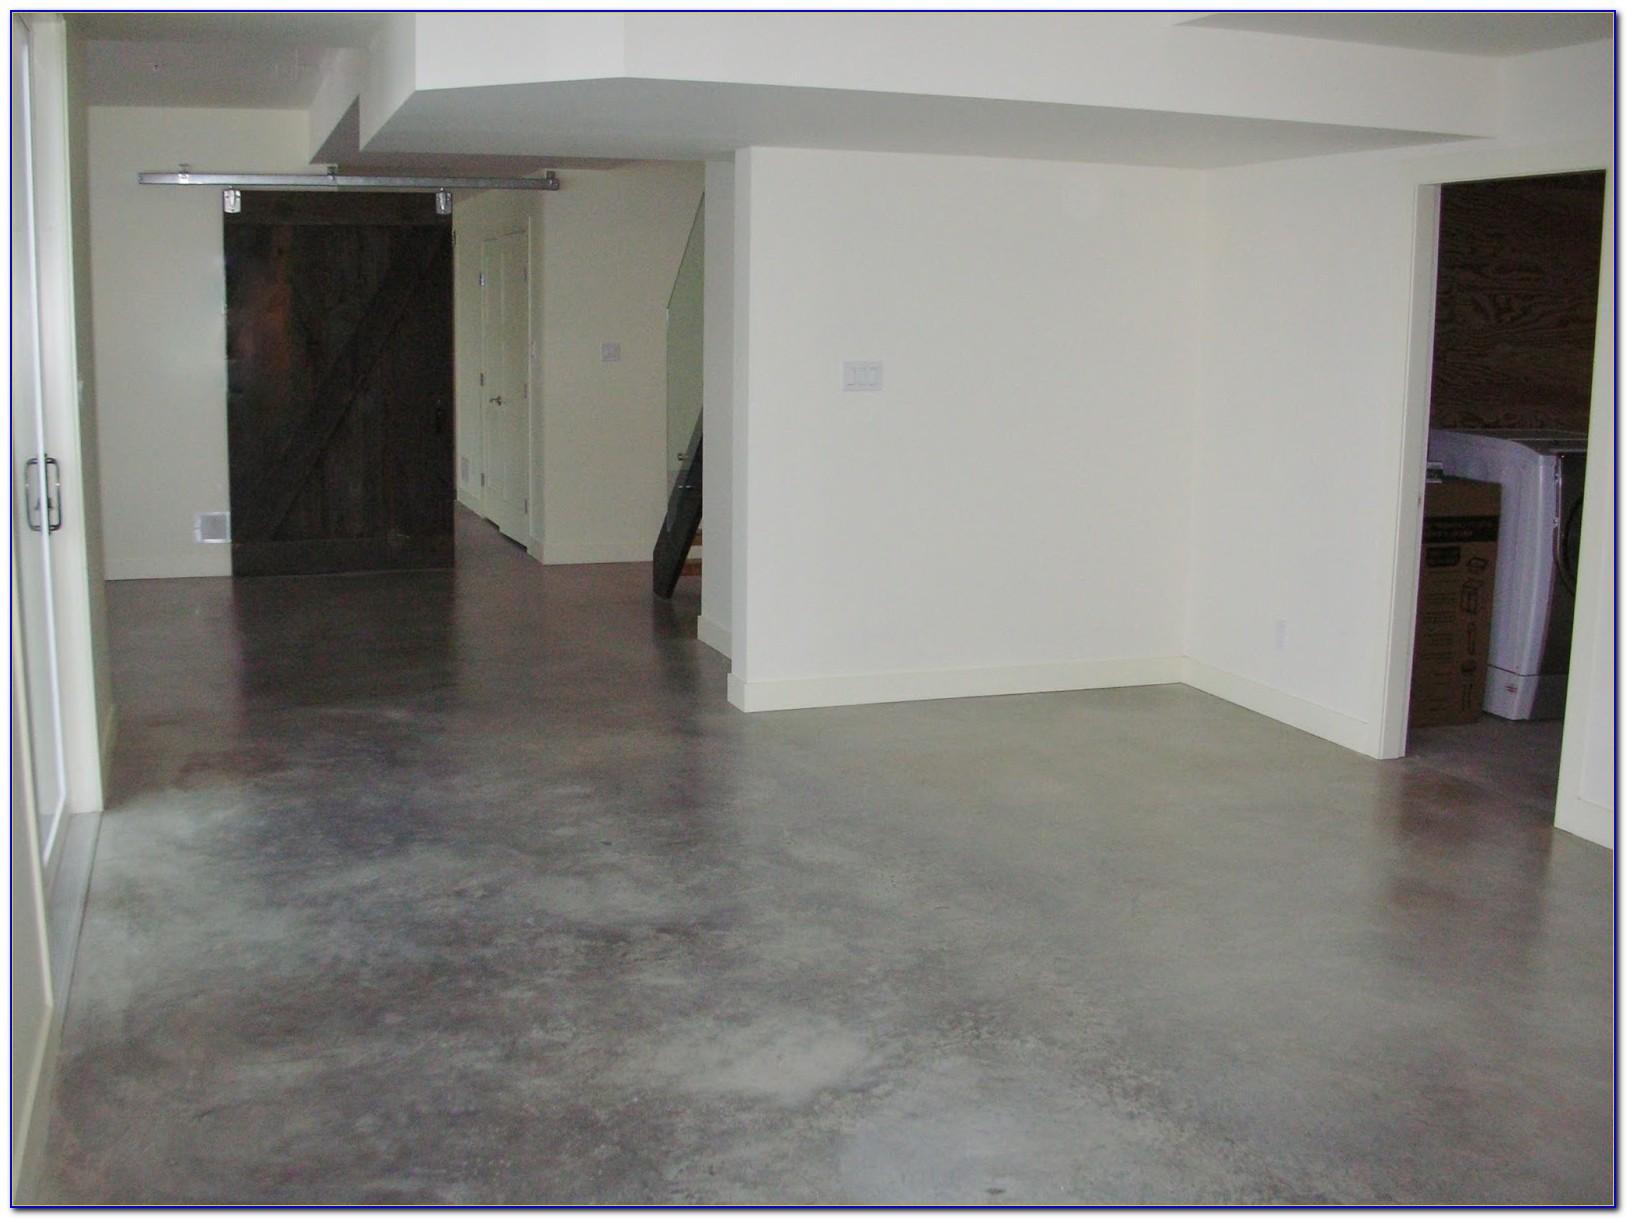 Stained Concrete Basement Floor Ideas